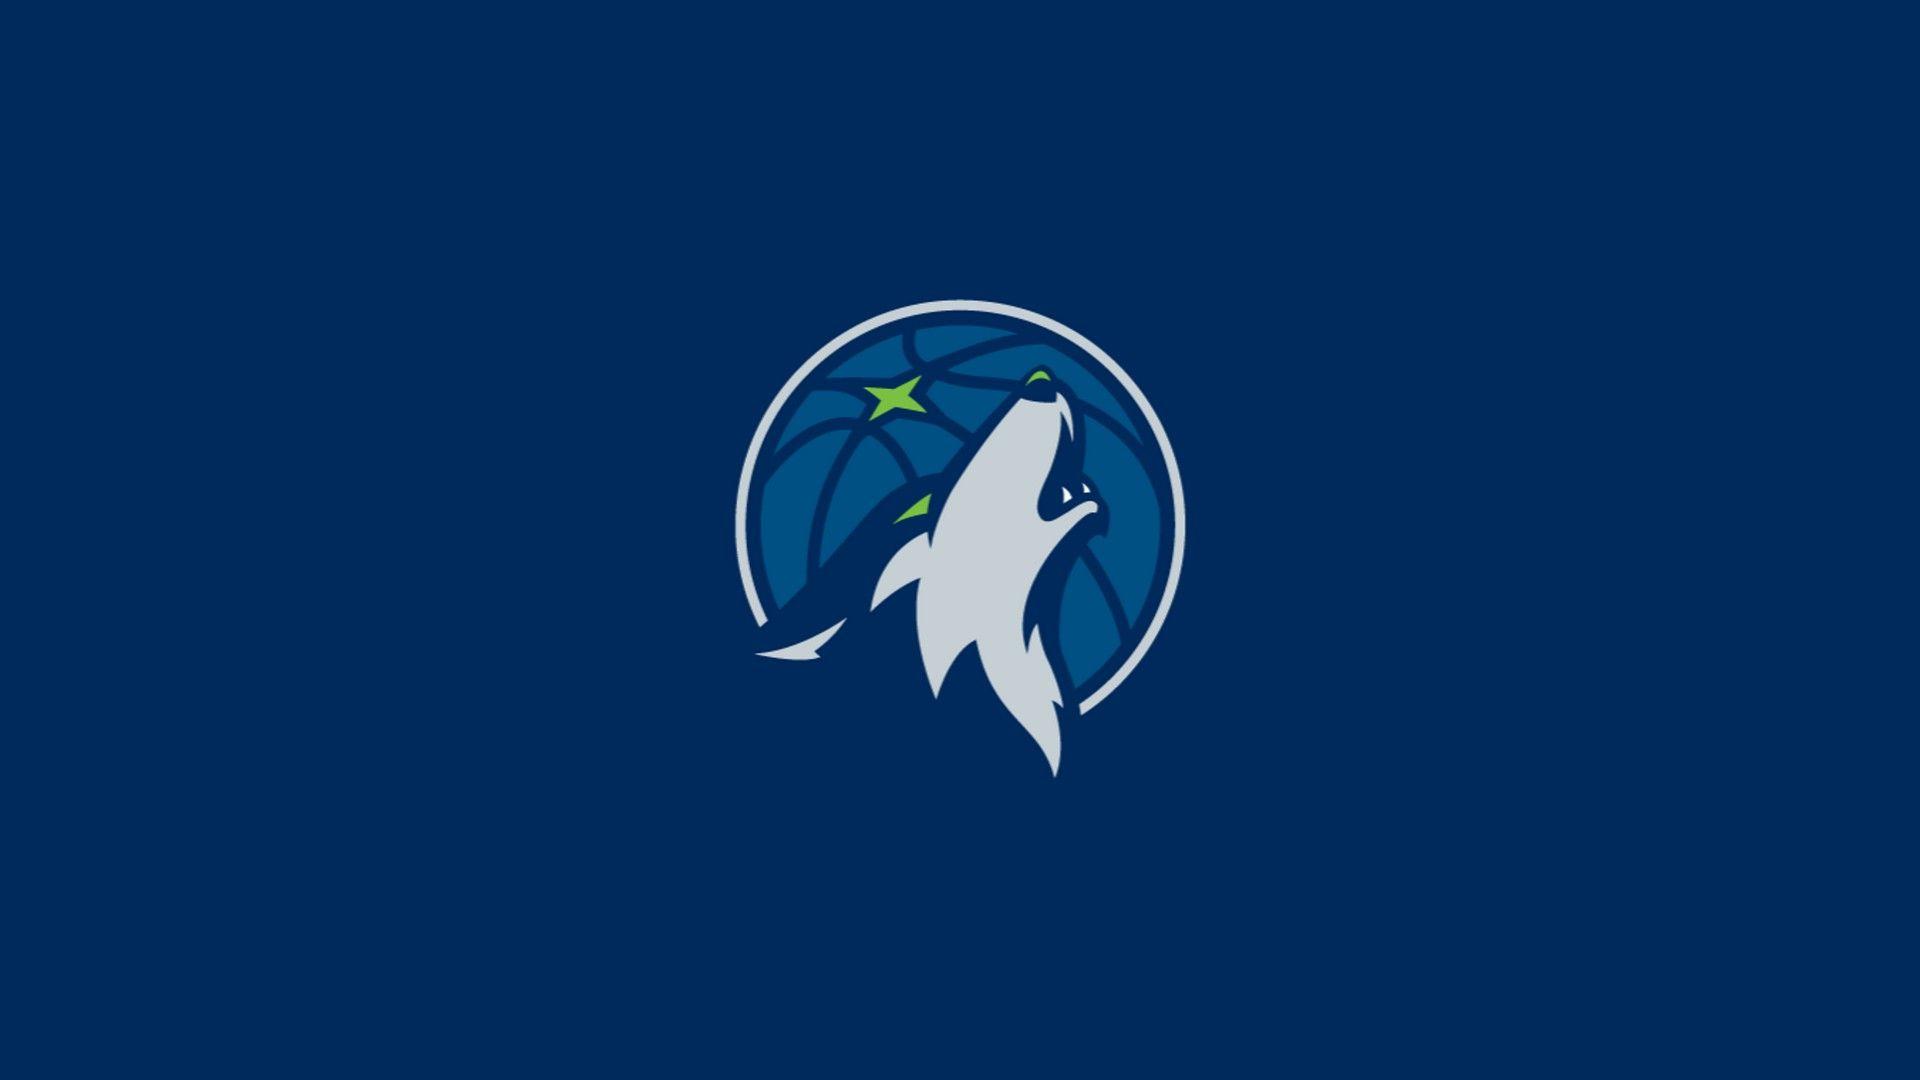 Minnesota Timberwolves laptop background